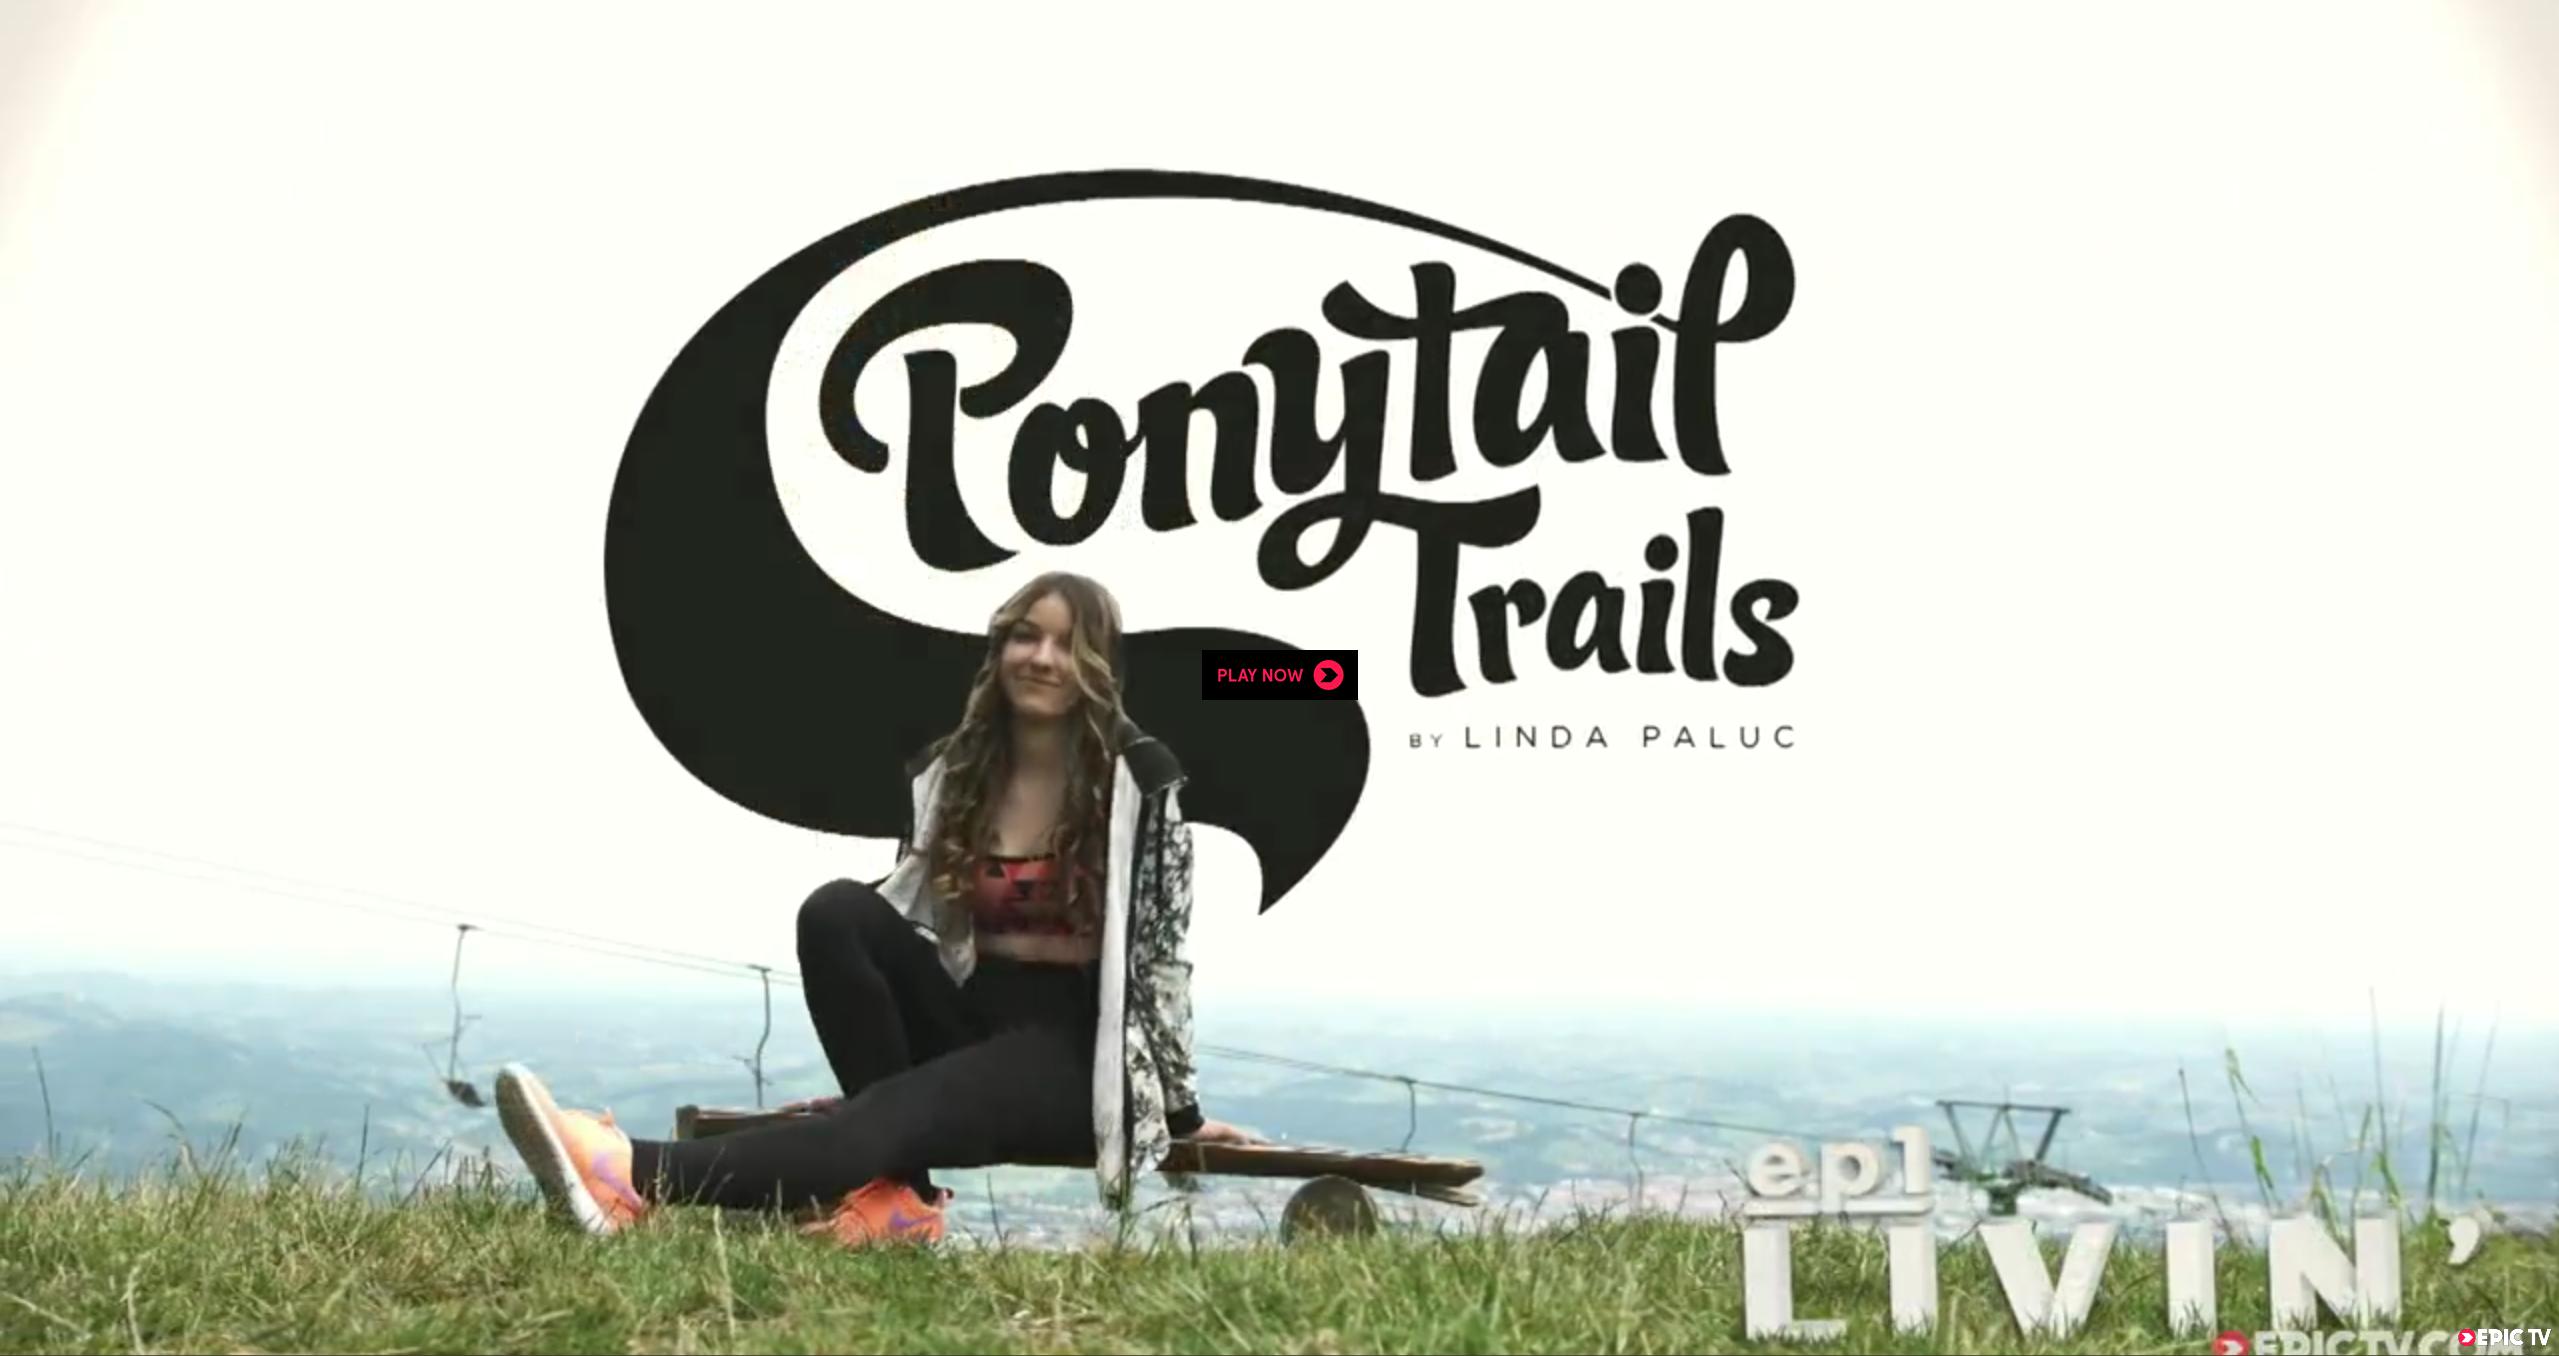 Linda Paluc - Slovenia | Ponytail Trails, Ep. 1